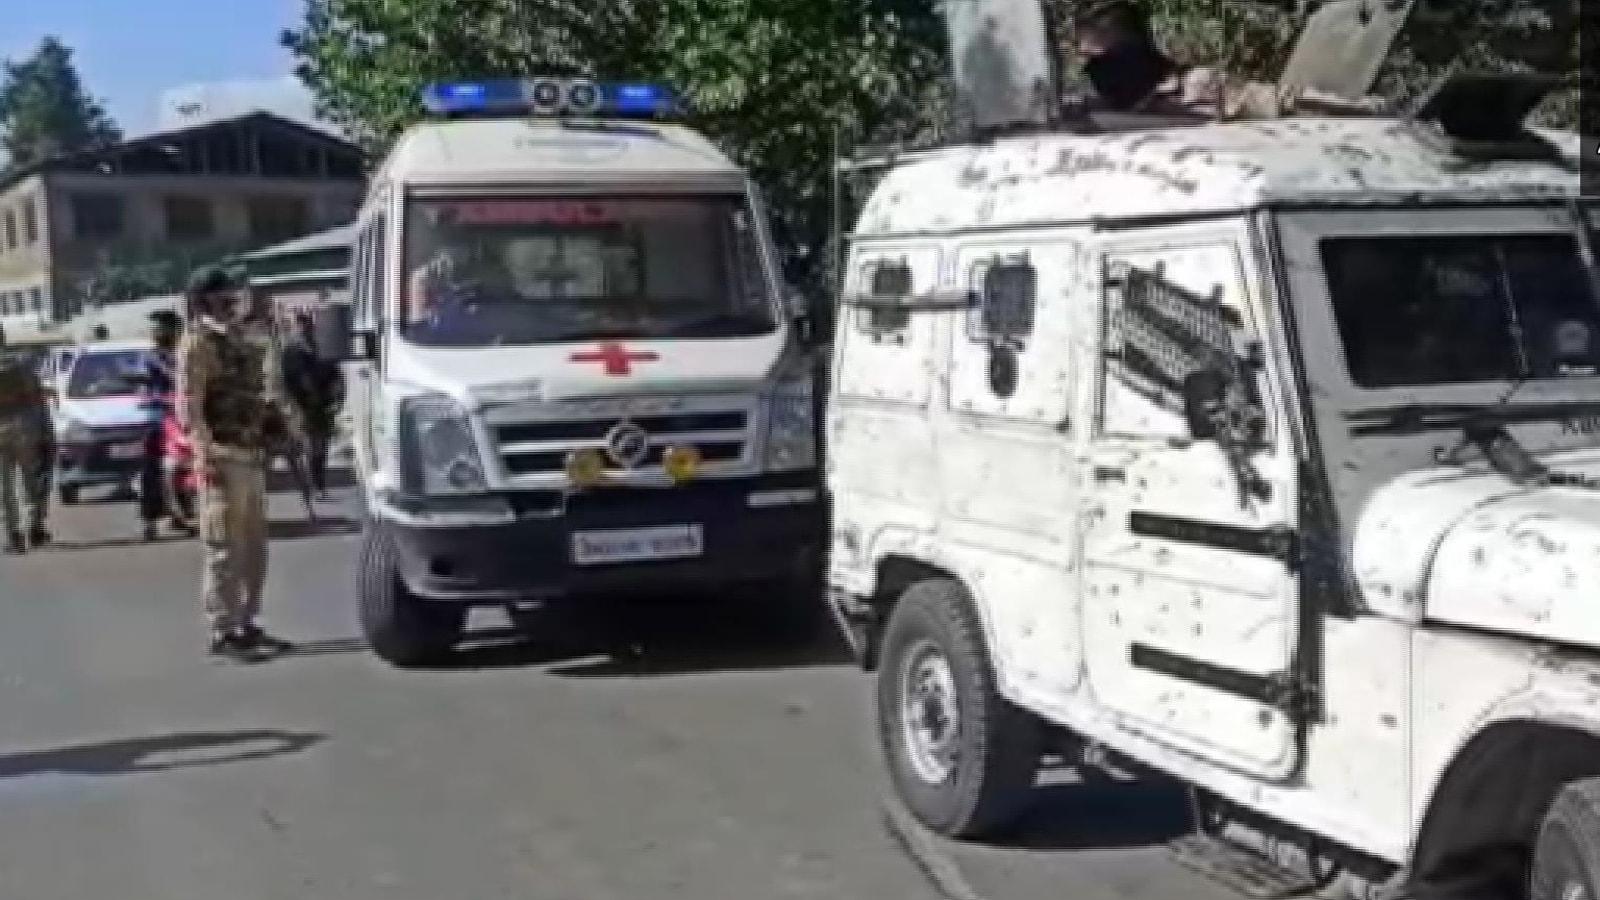 BJP leader Gulam Rasool Dar, his wife shot dead by terrorists in J&K's  Anantnag | Latest News India - Hindustan Times